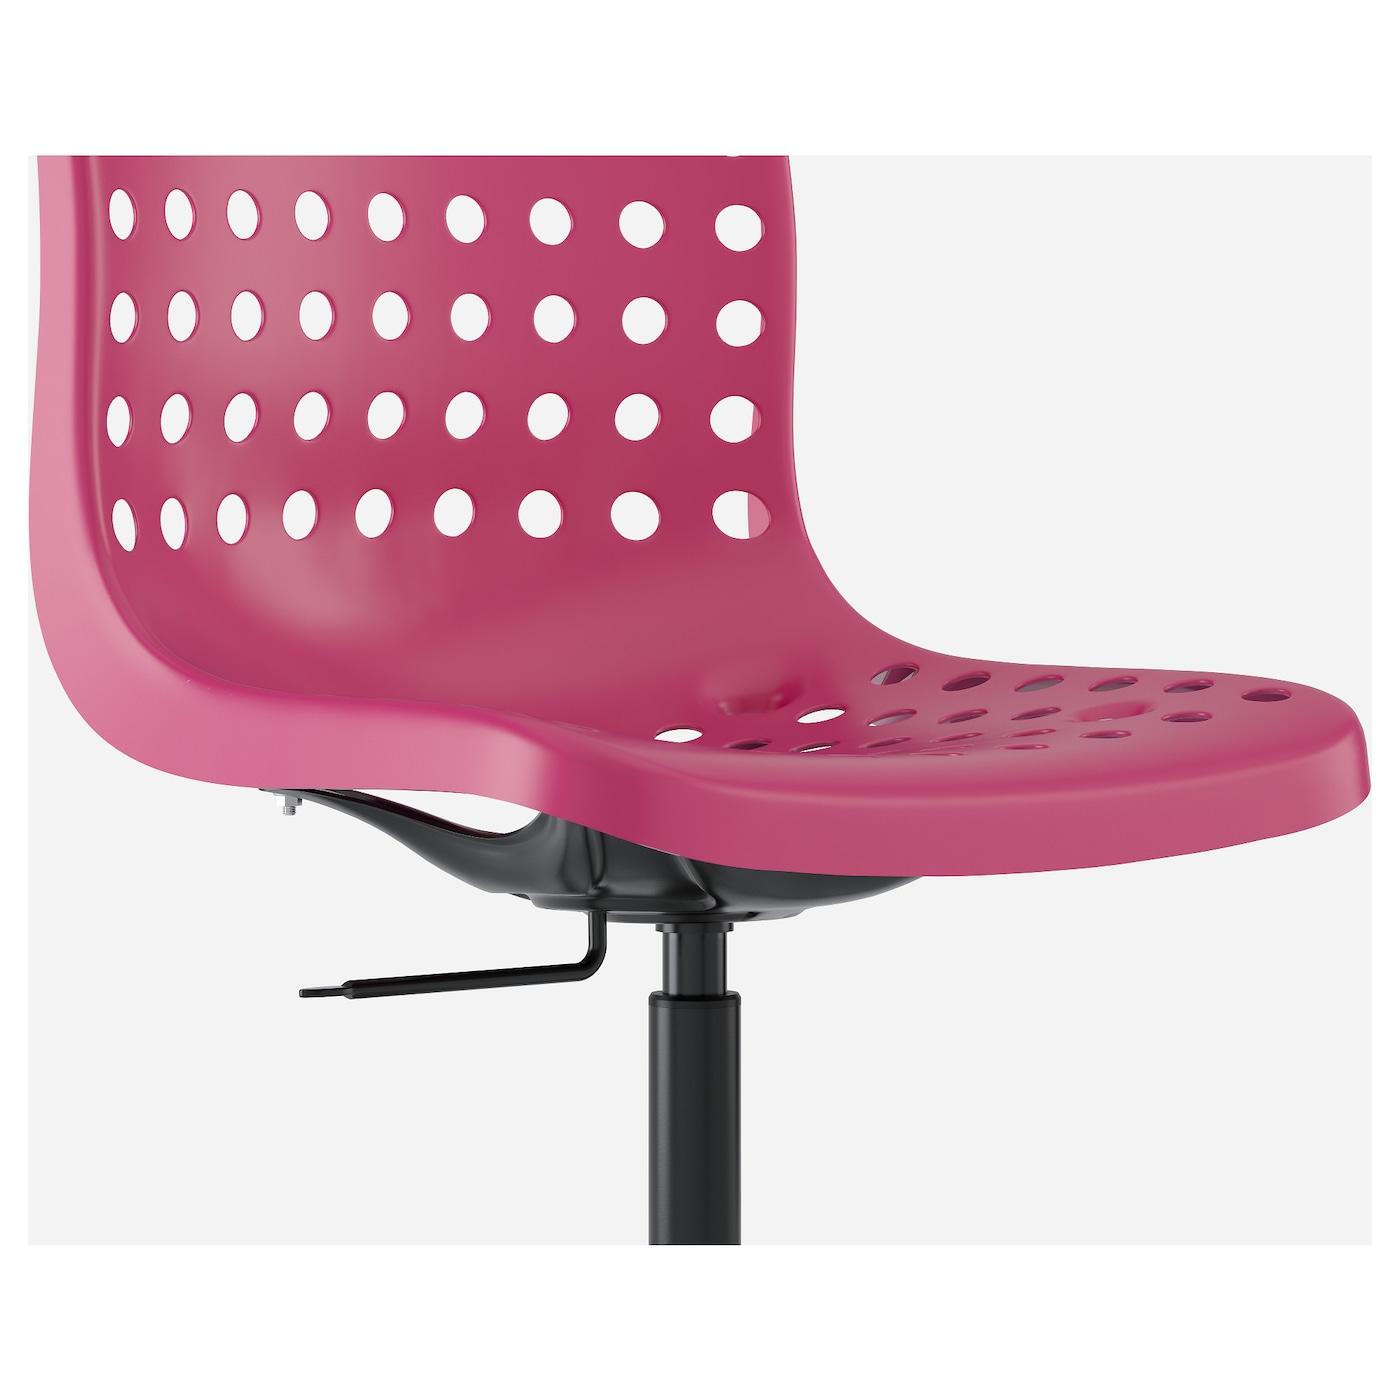 Leisure Modern Purple Leather Swivel Salon Chair With  : skC3A5lberg sporren swivel chair pink black0399466pe563499s5 from tolkienacrossthewater.com size 2000 x 2000 jpeg 230kB